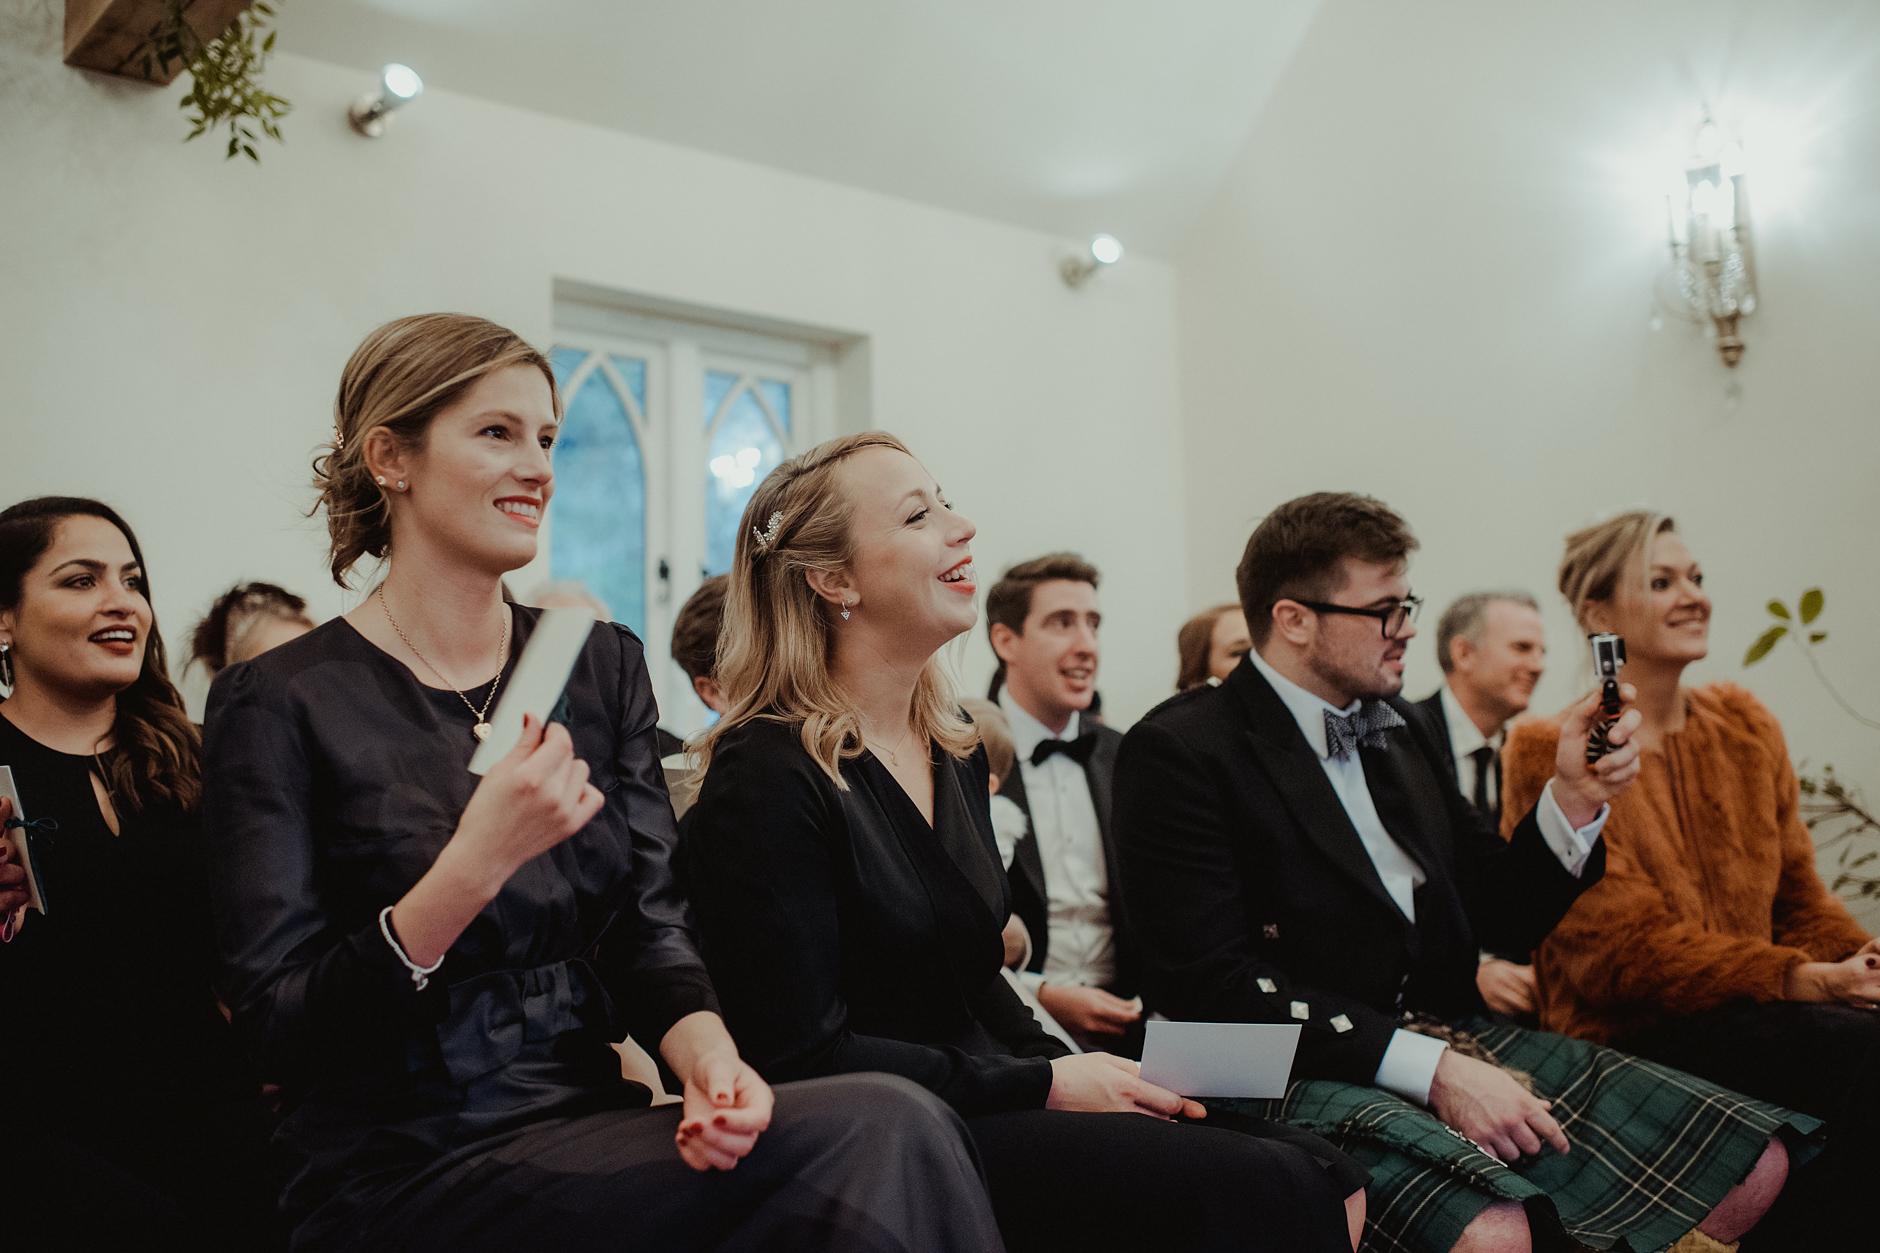 Glentruim-Wedding-Nikki-Leadbetter-Photography-97.jpg